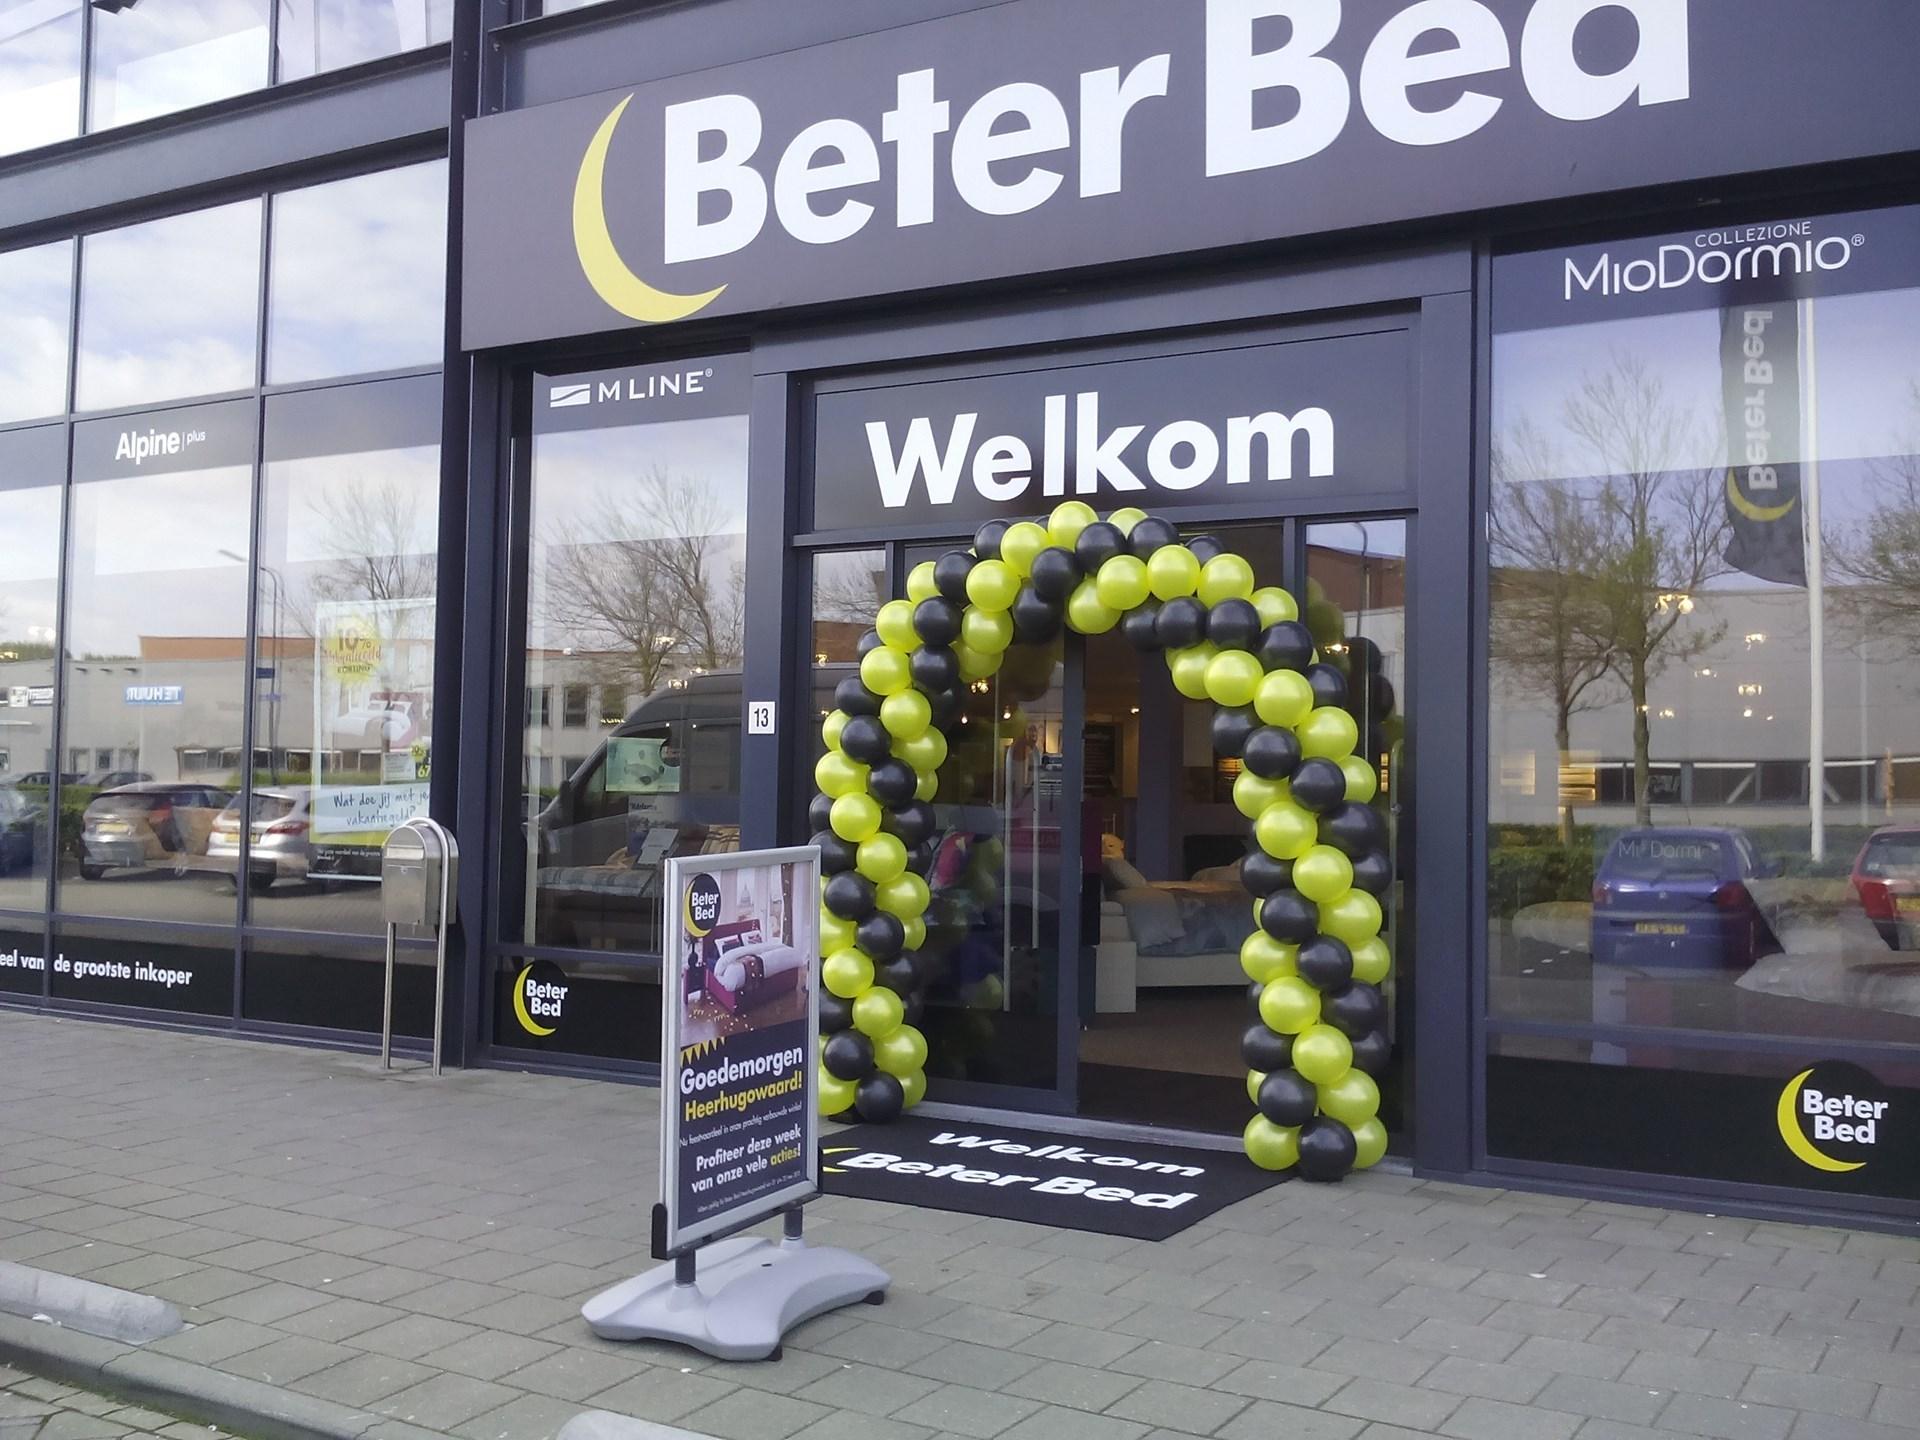 Houtsma Keukens Zaandam : Ballonnen decoraties houtsma keukens hema beter bed